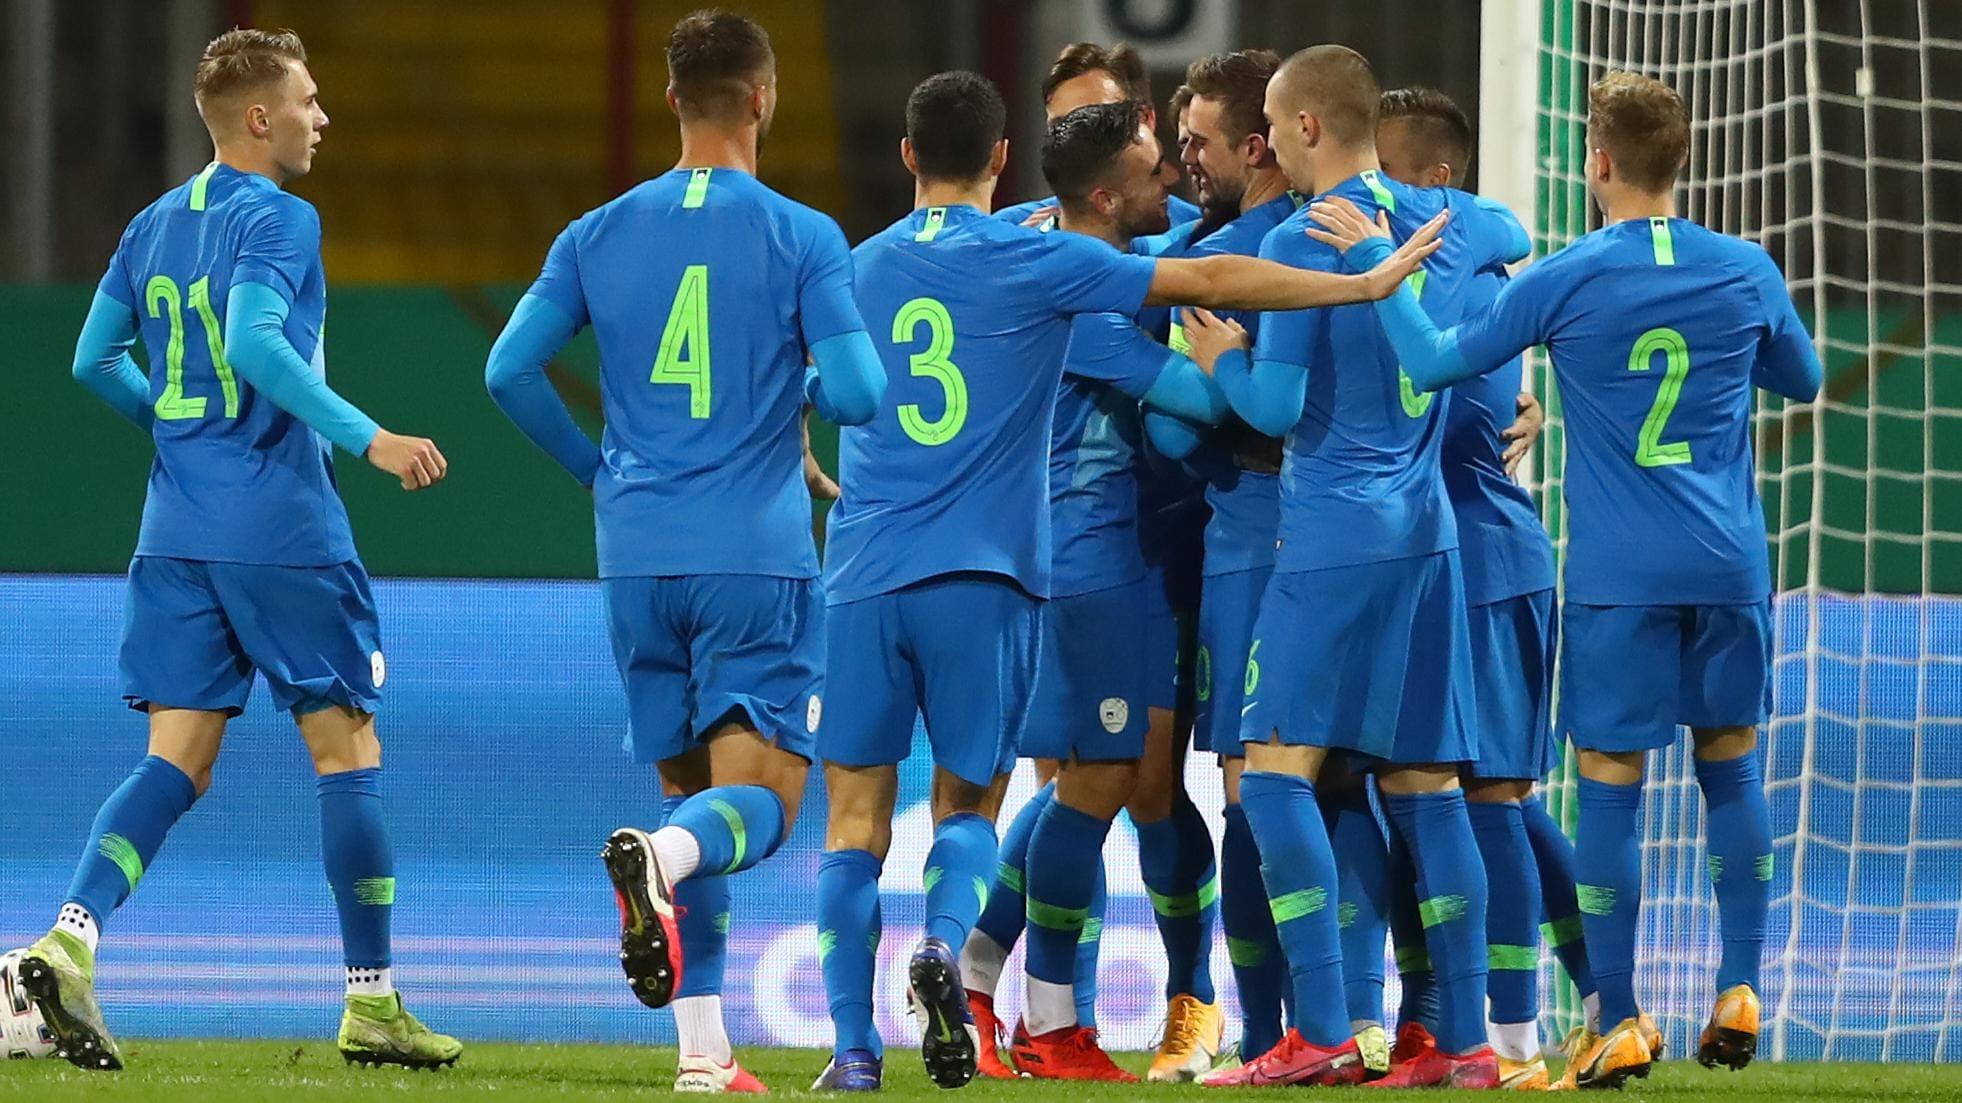 Slovenia vs Spain: facts